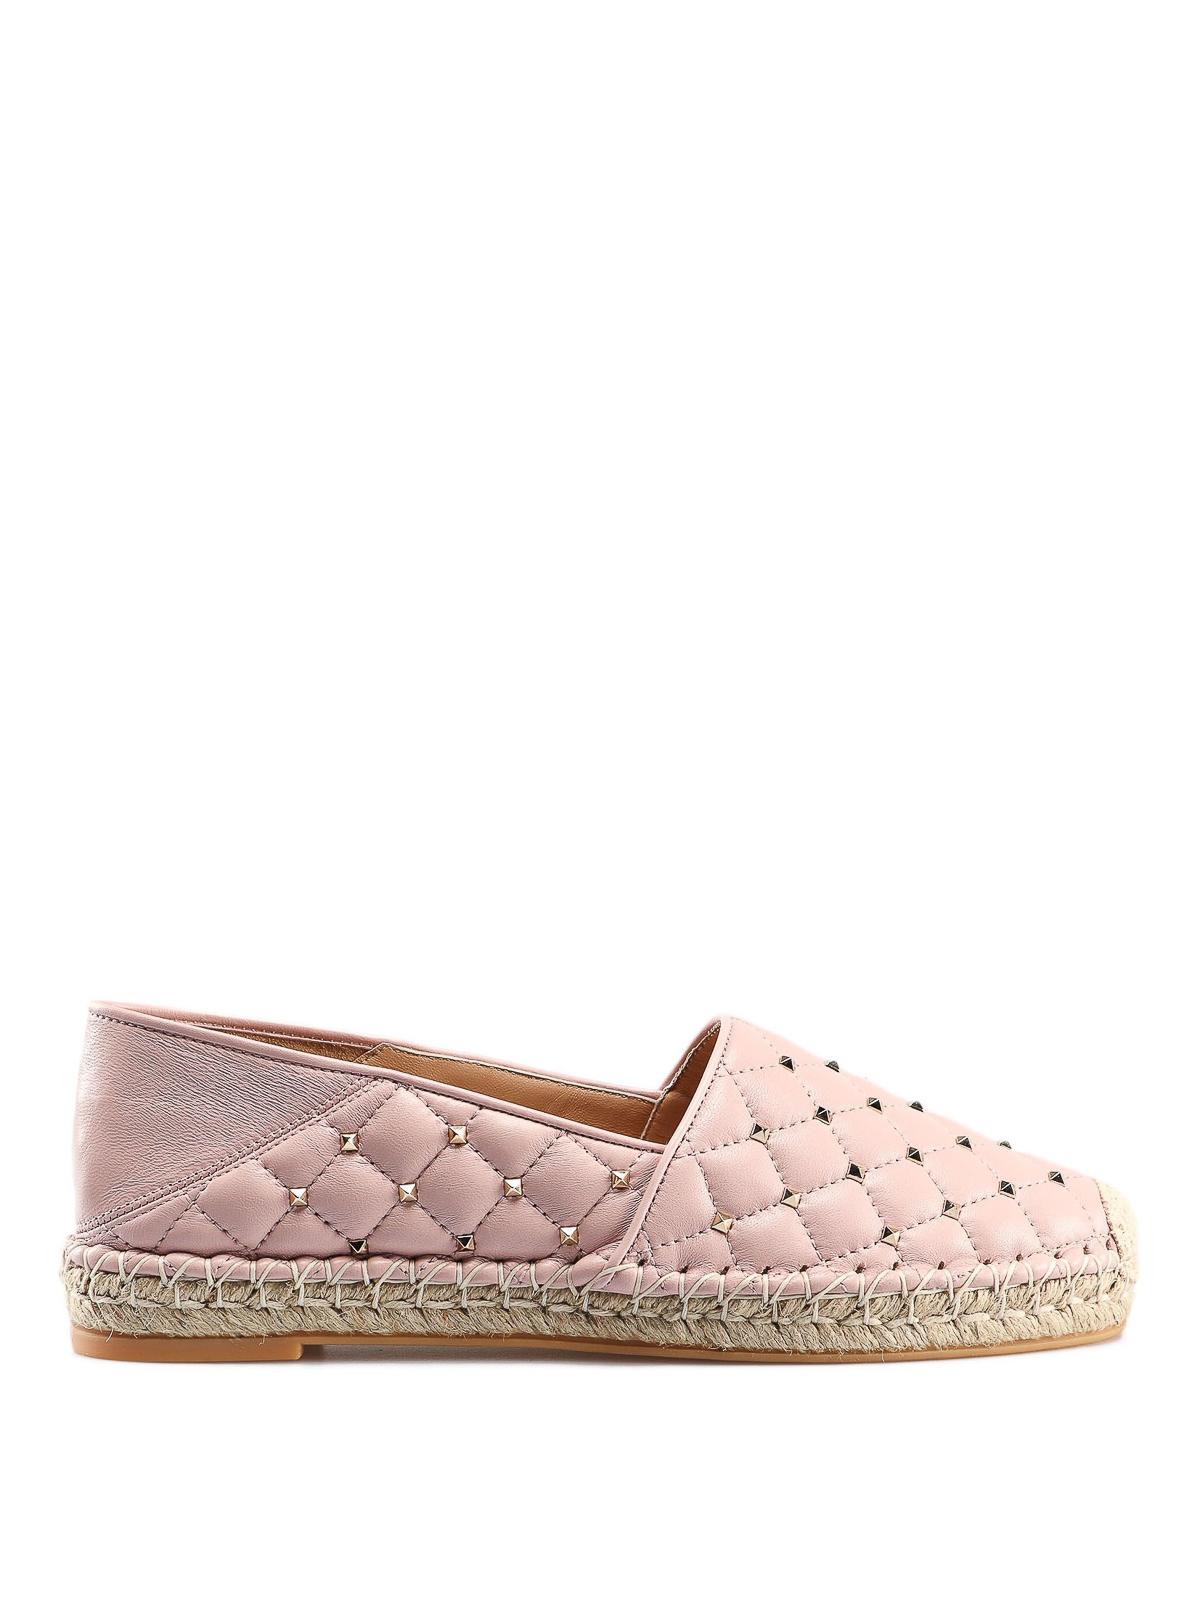 237cbe4be VALENTINO GARAVANI: espadrilles - Rockstud light pink leather espadrilles